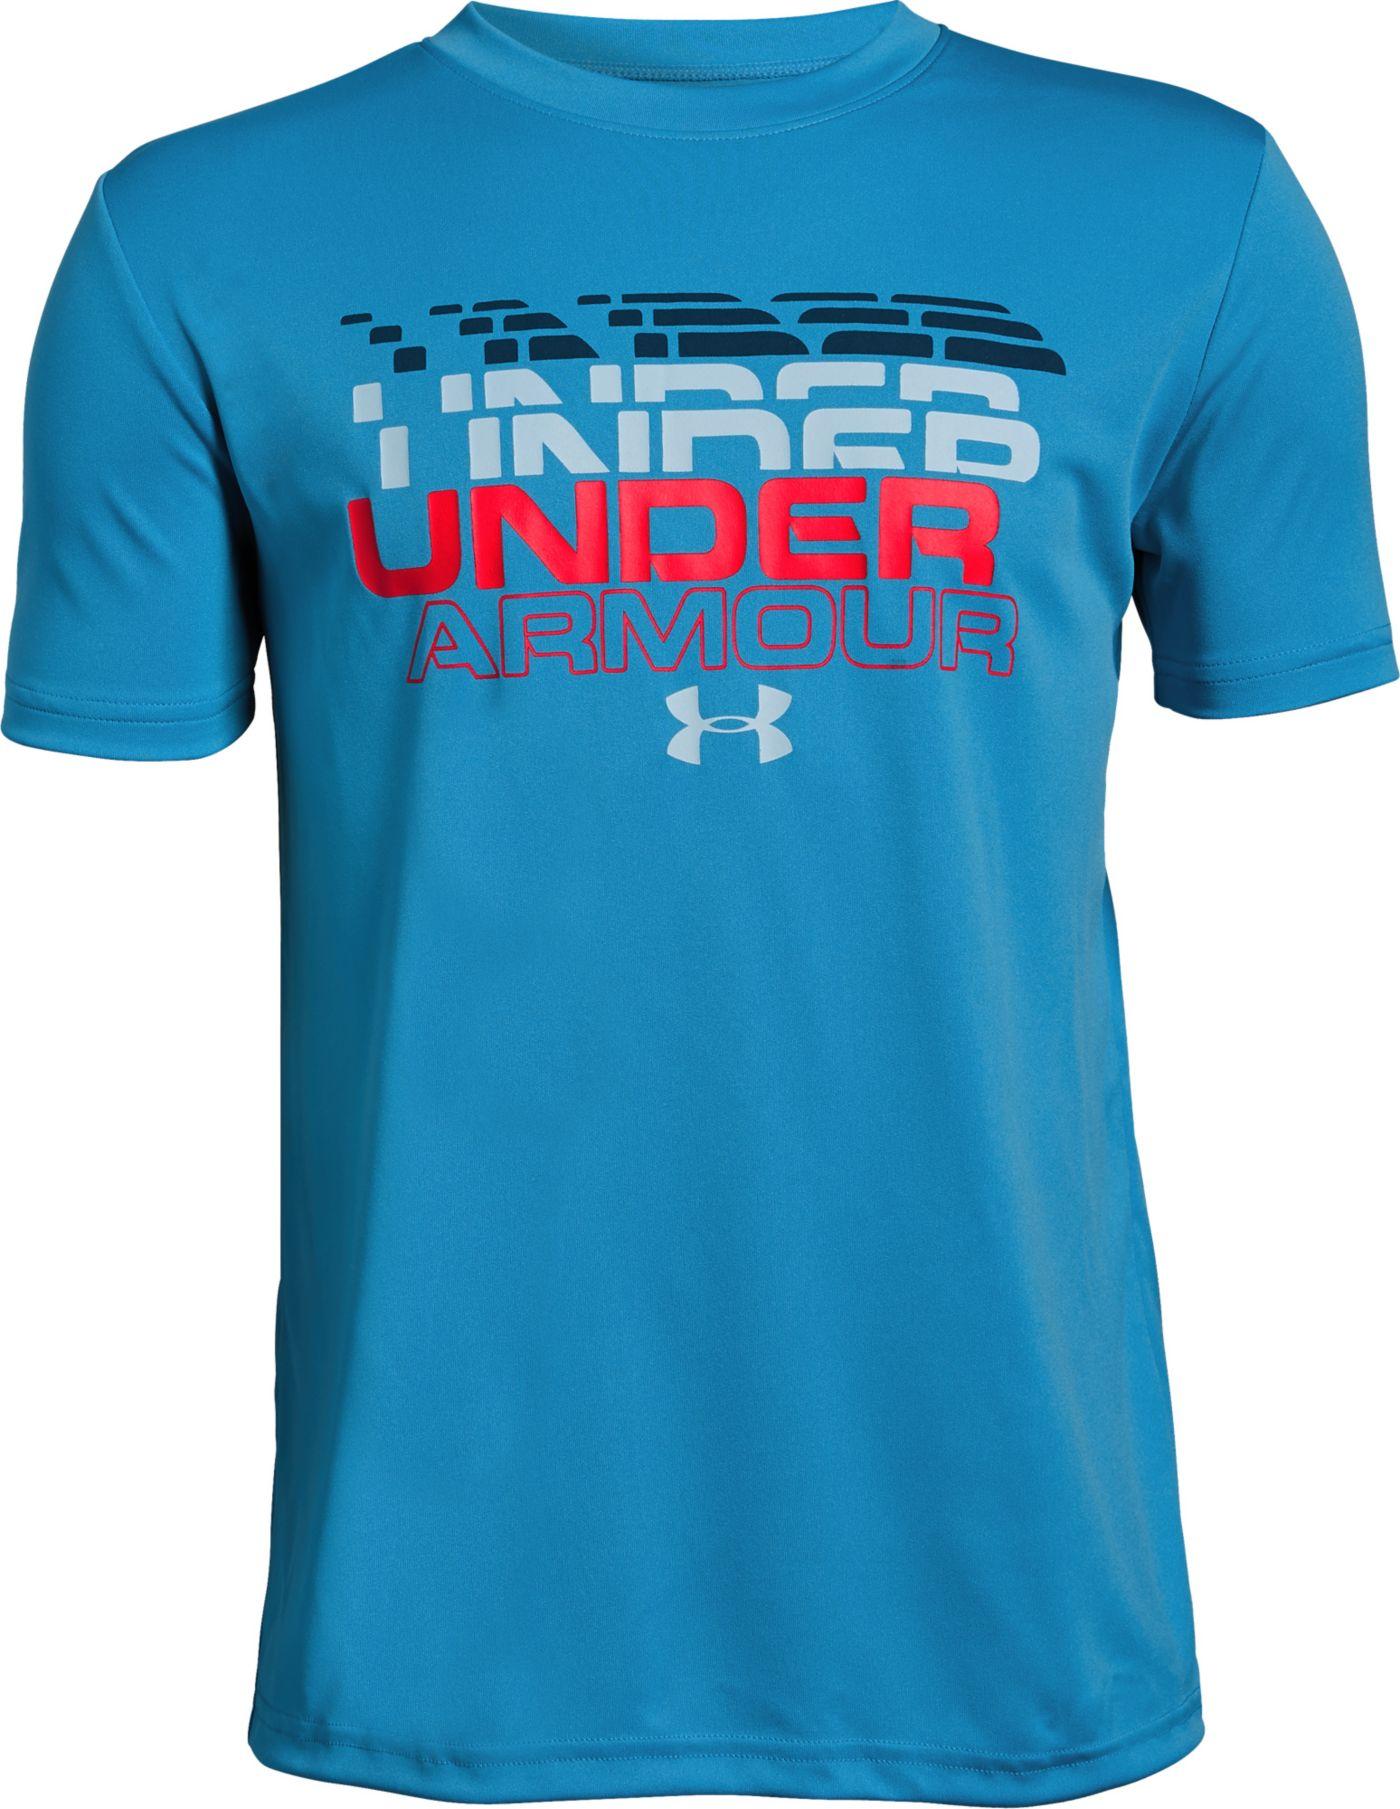 Under Armour Boy's Stepped Wordmark T-Shirt